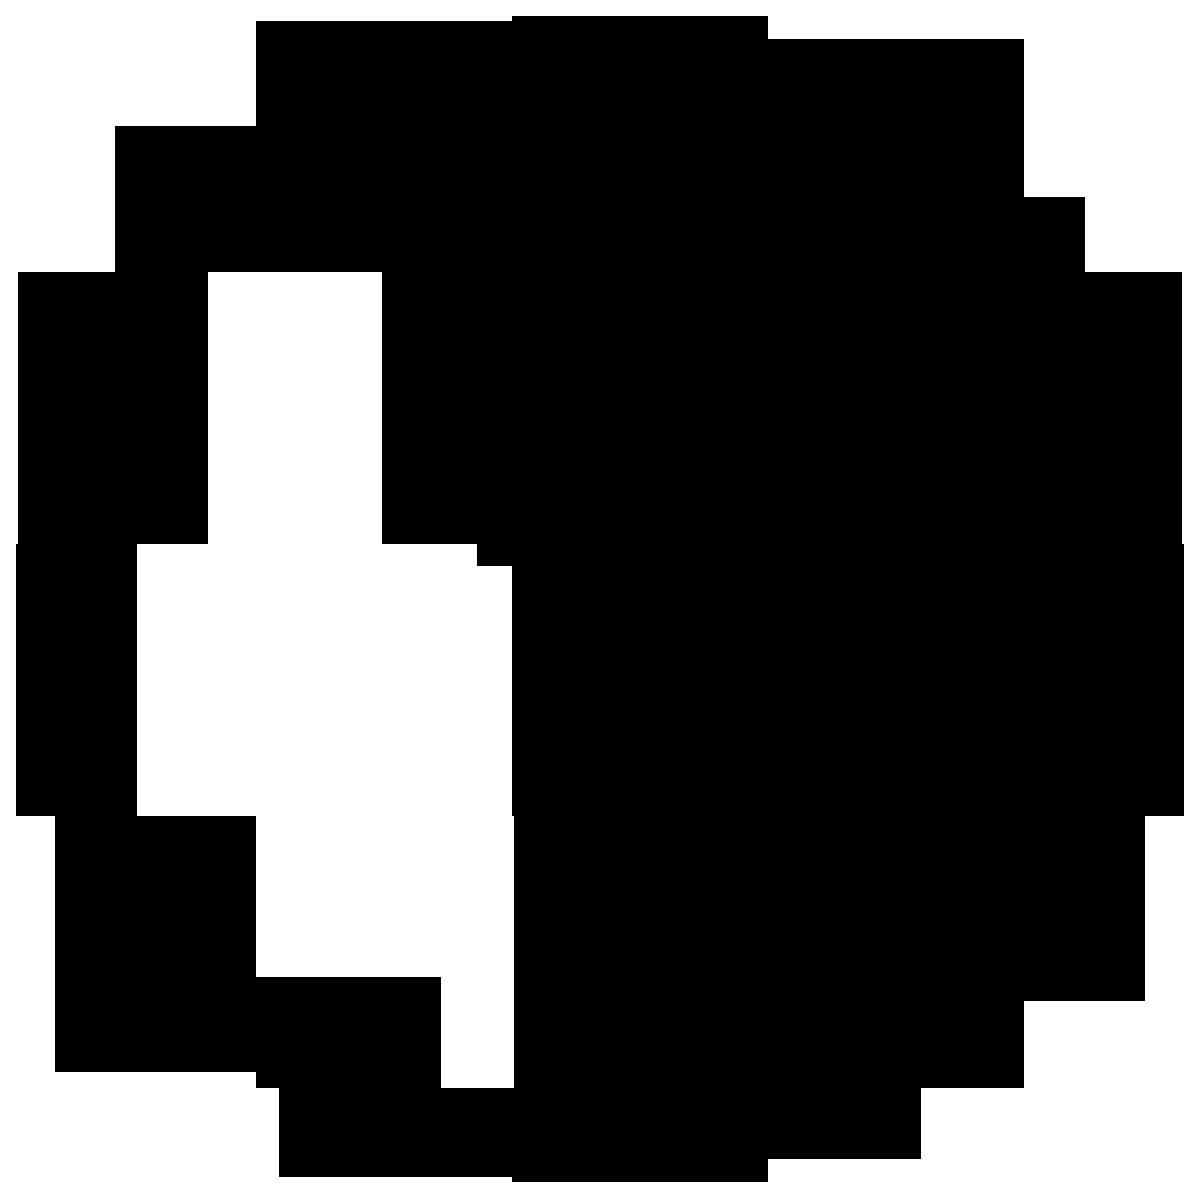 File:Yin&Yang trasparent.png - Wikimedia Commons